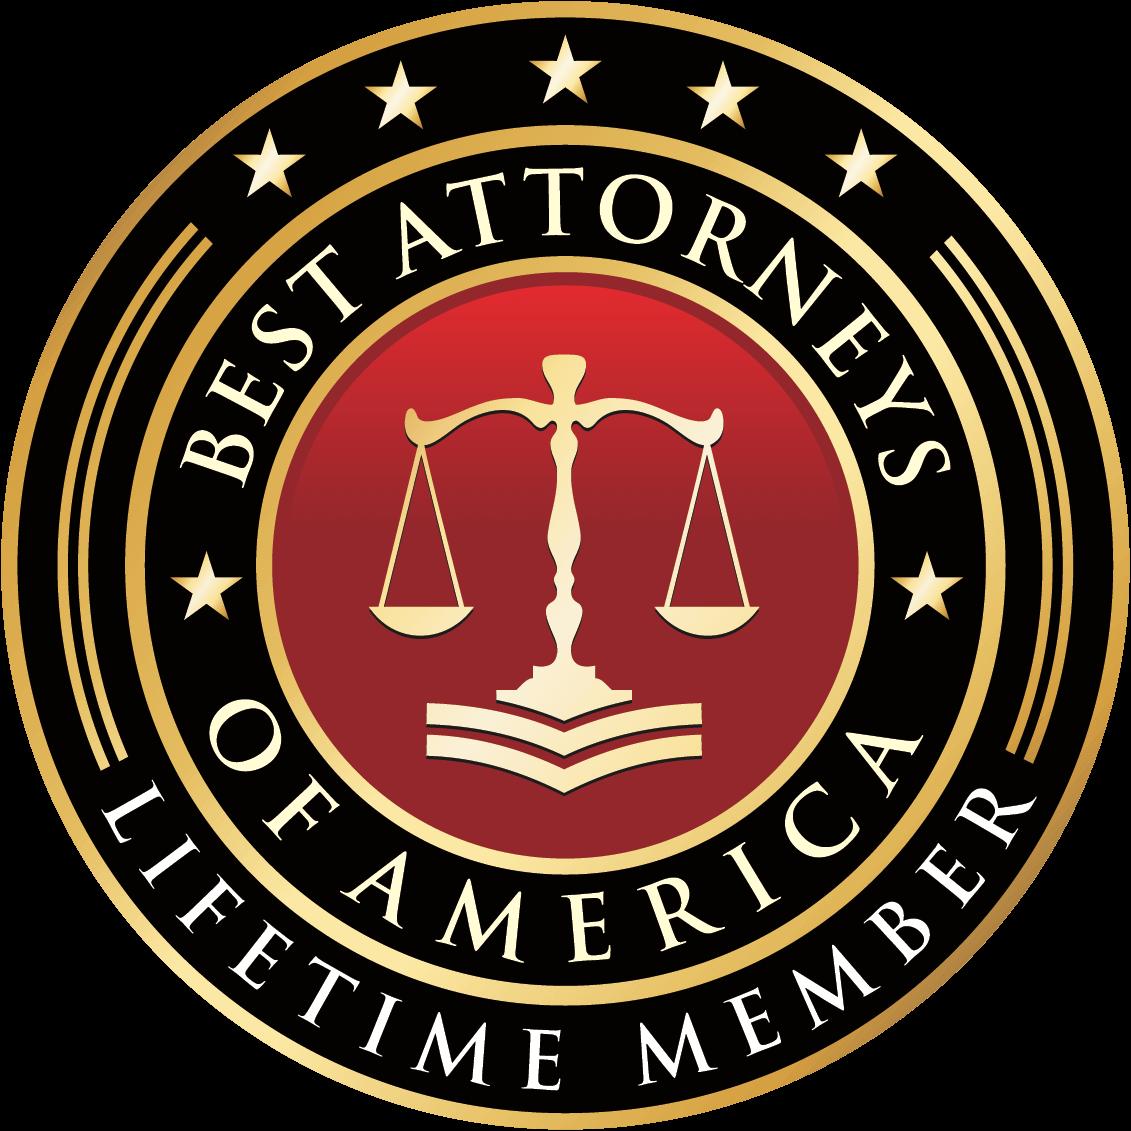 Best Attorneys Of America - Lifetime Member